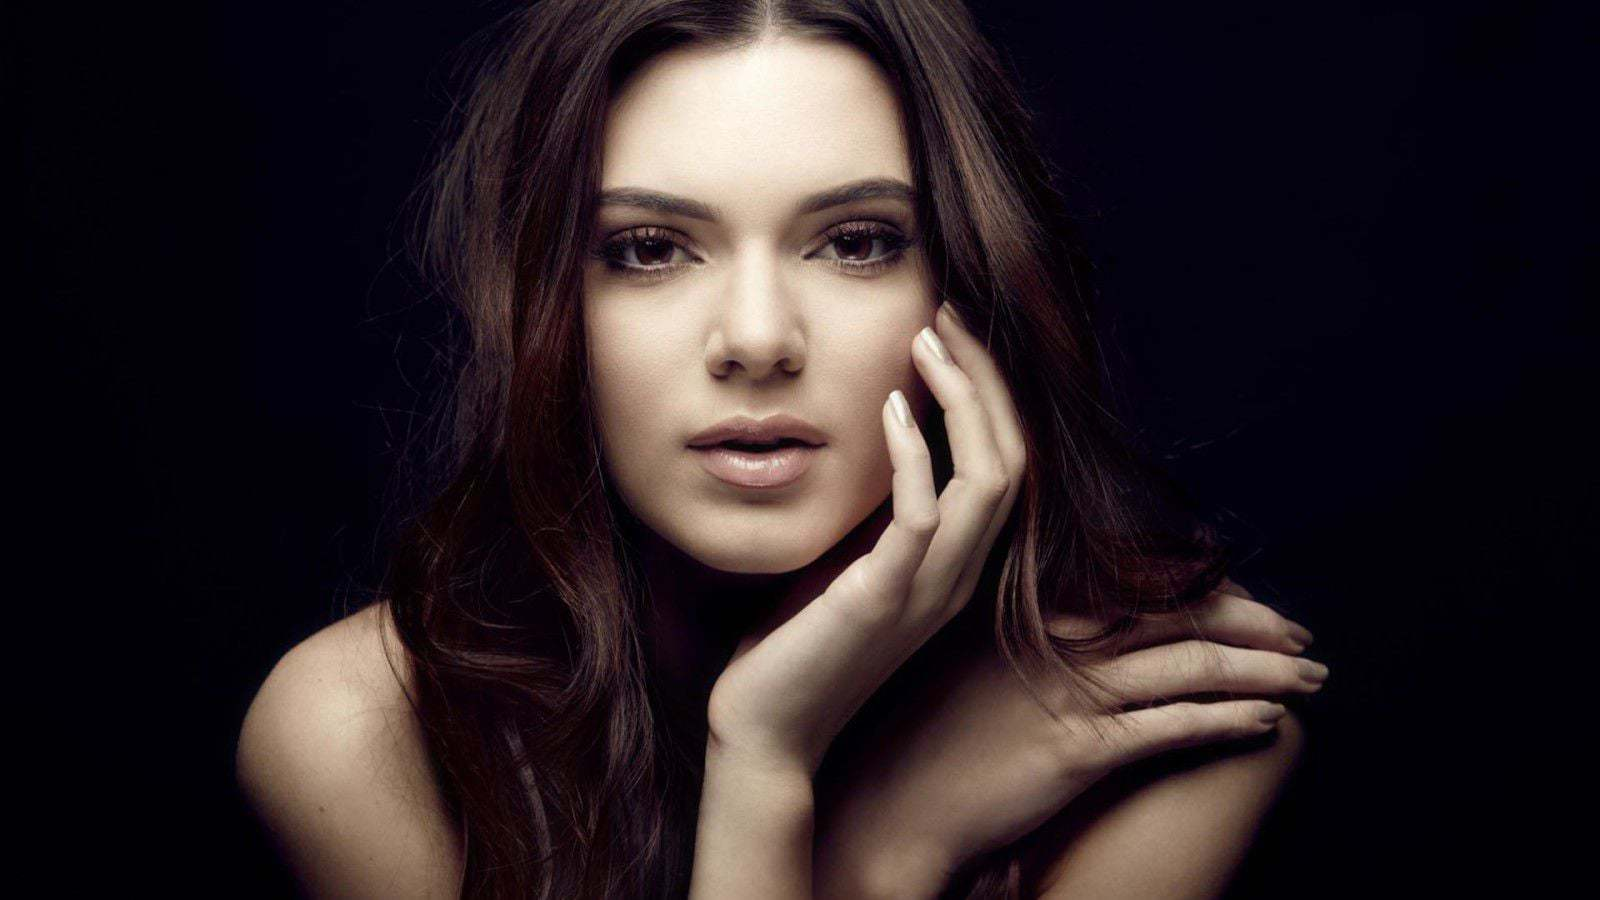 Kendall Jenner HD Desktop